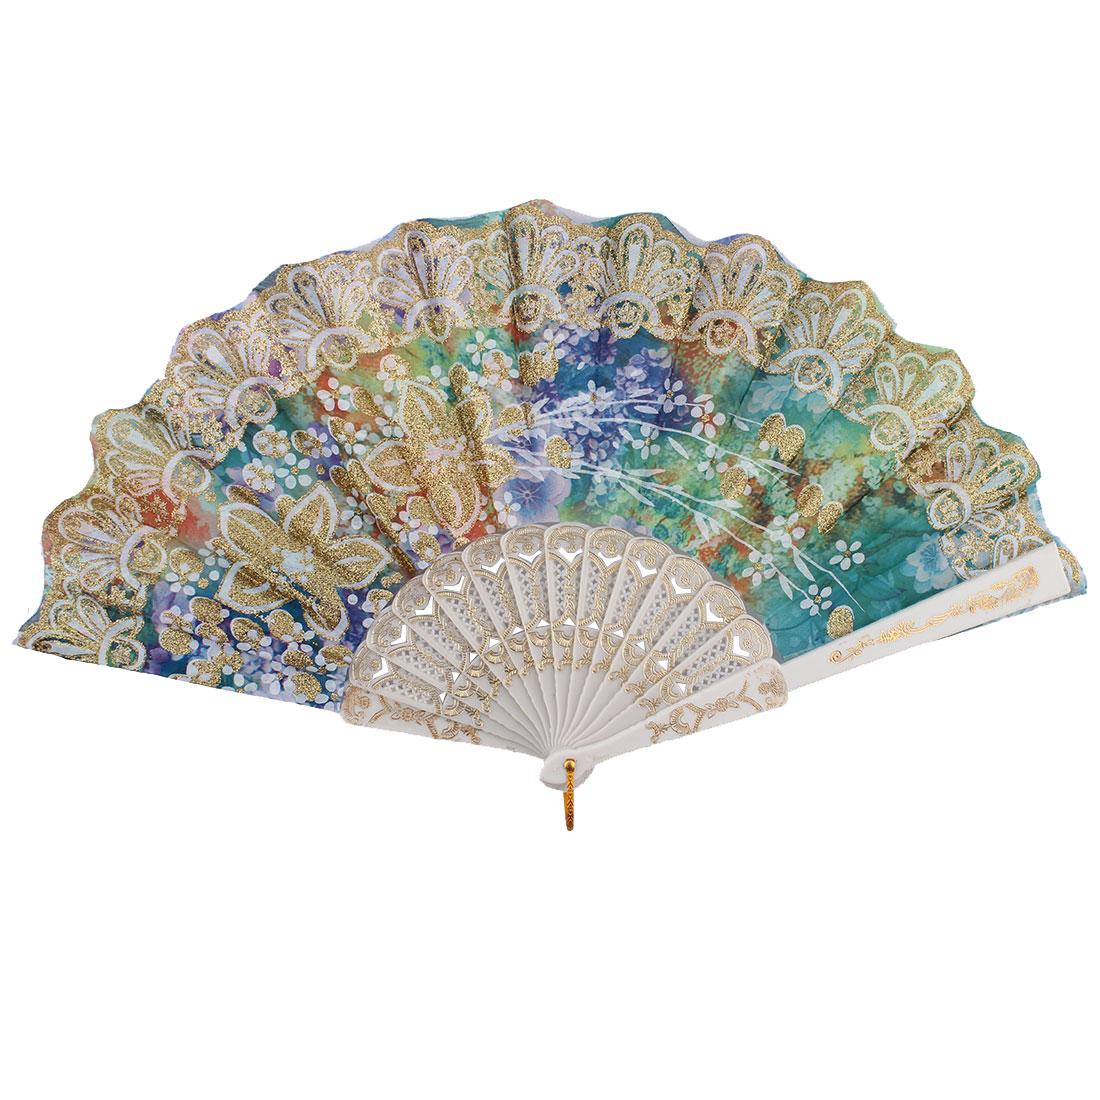 Chinese Style Wedding Party Glitter Flower Decor Plastic Ribs Frame Folding Hand Fan